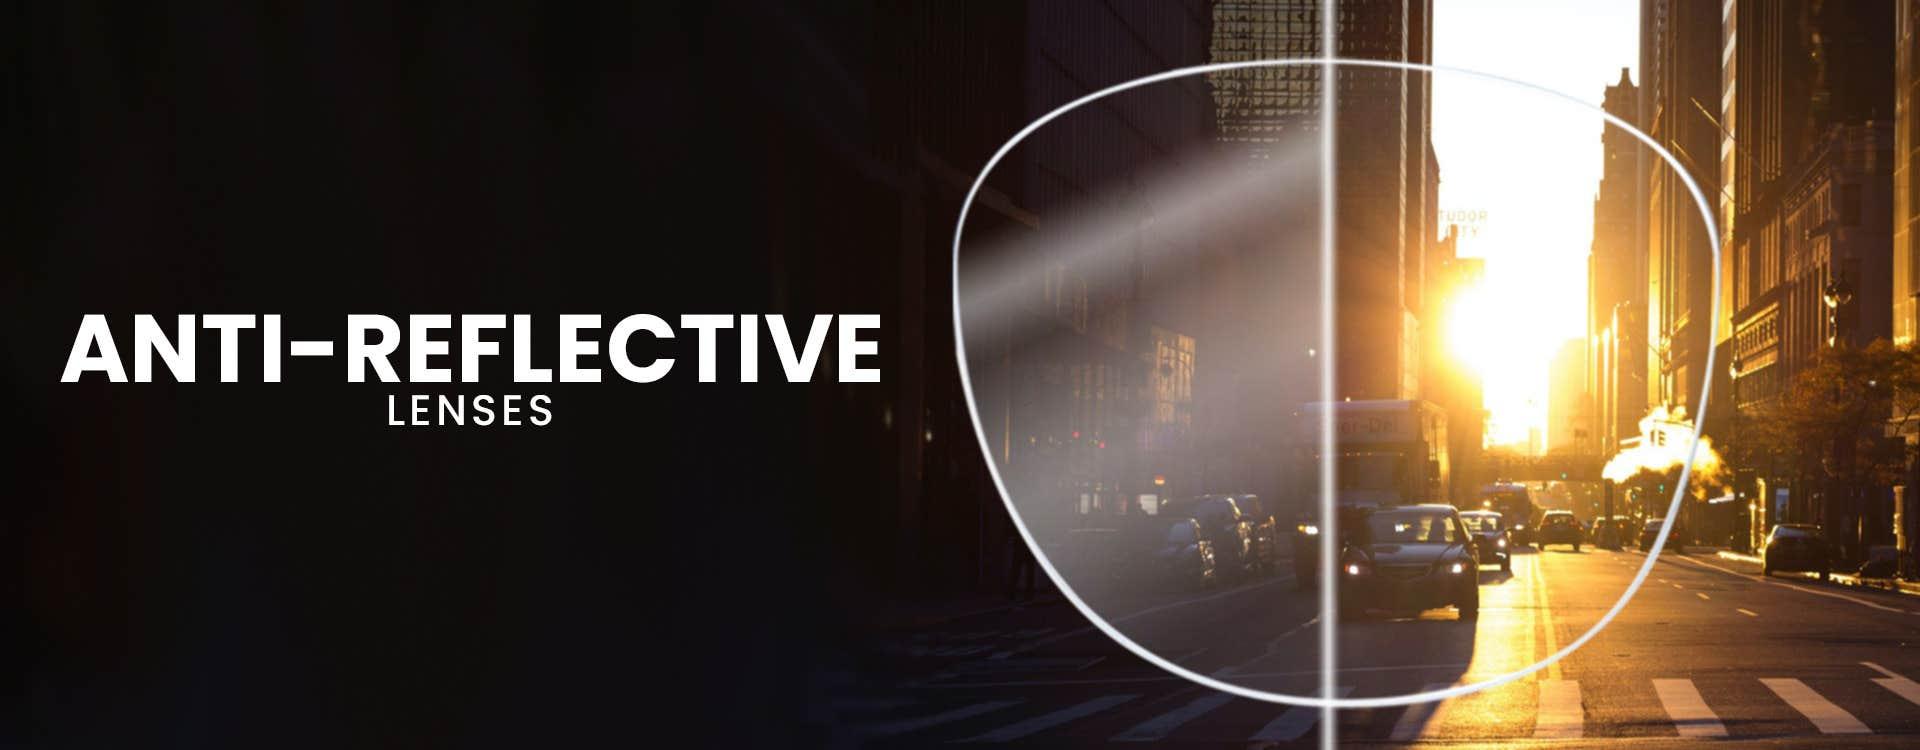 1) Anti-Reflective Lenses